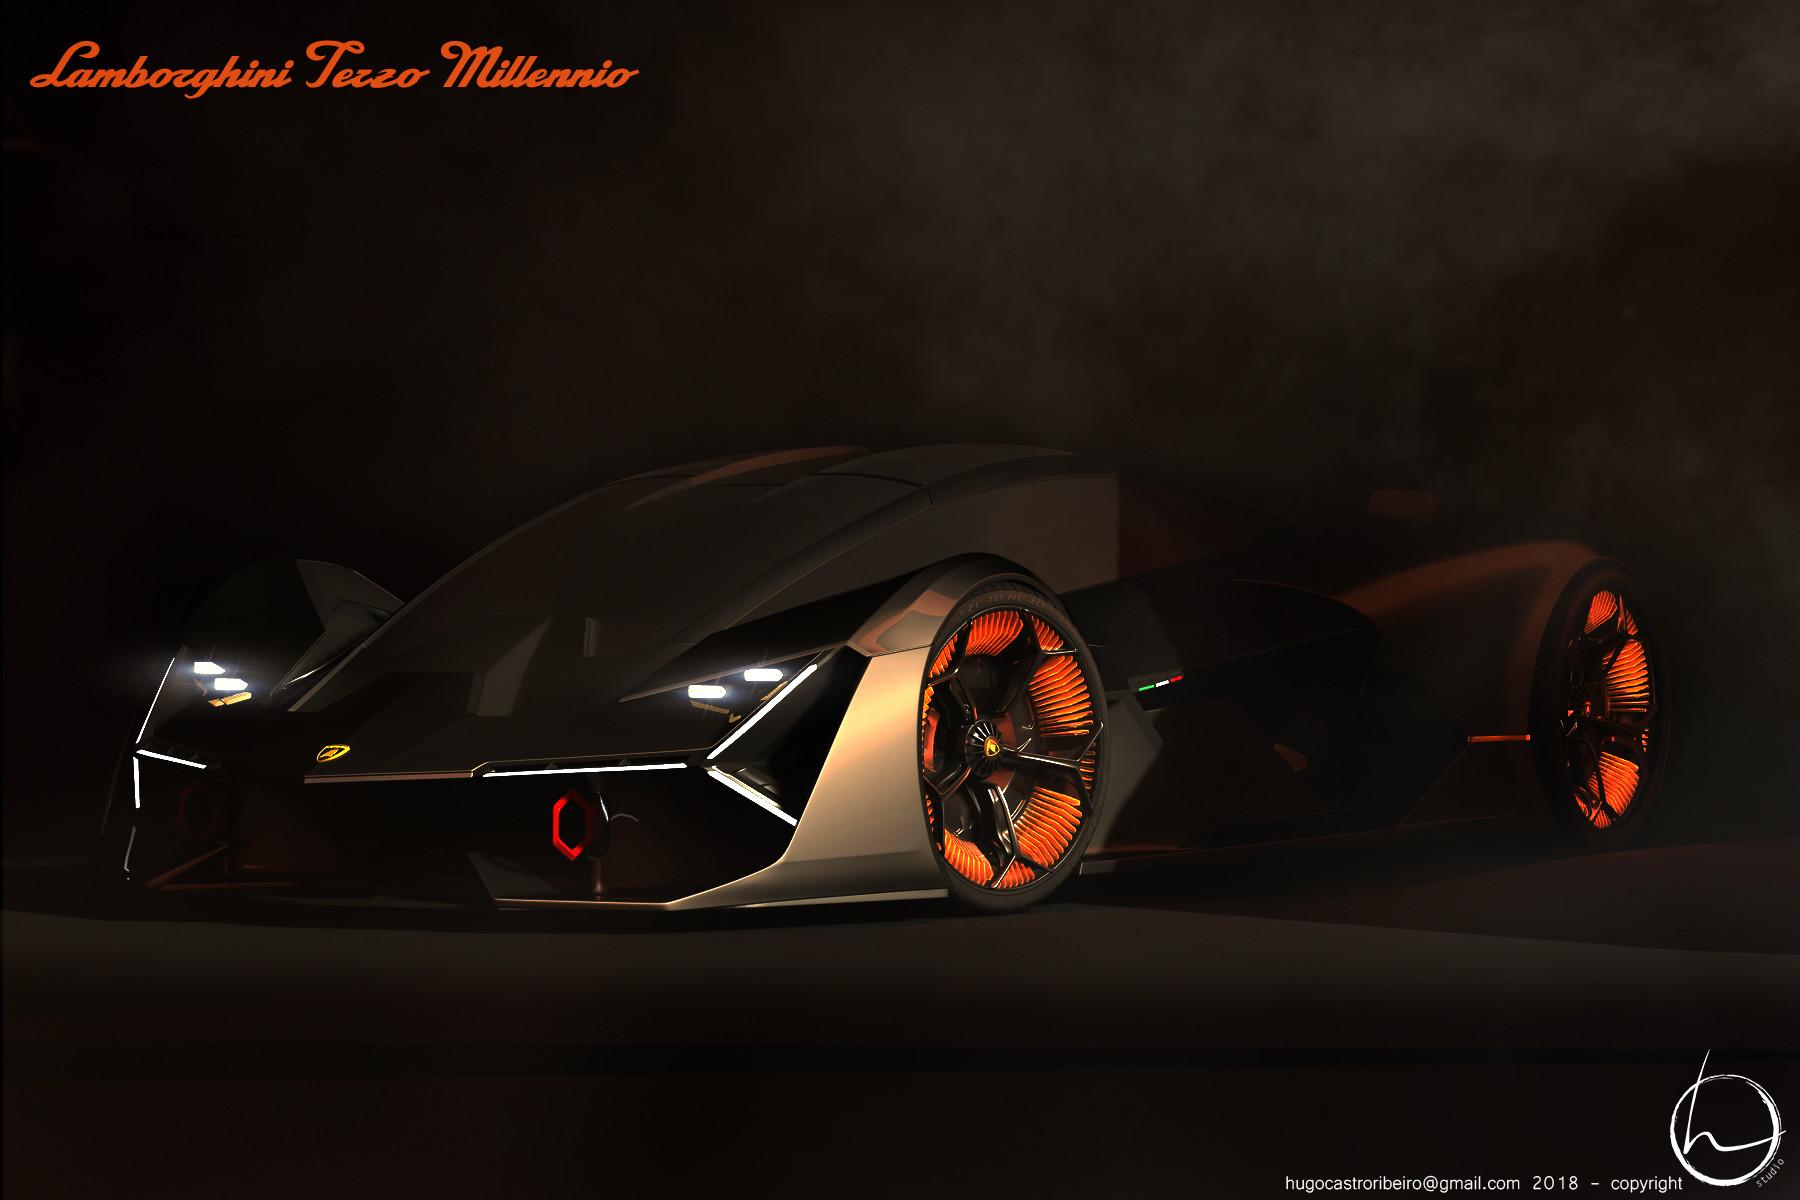 Beautiful Lamborghini Terzo Millennio - hugo-ribeiro-lamborghini-terzo-millennio  Pic_632353.jpg?1518814092